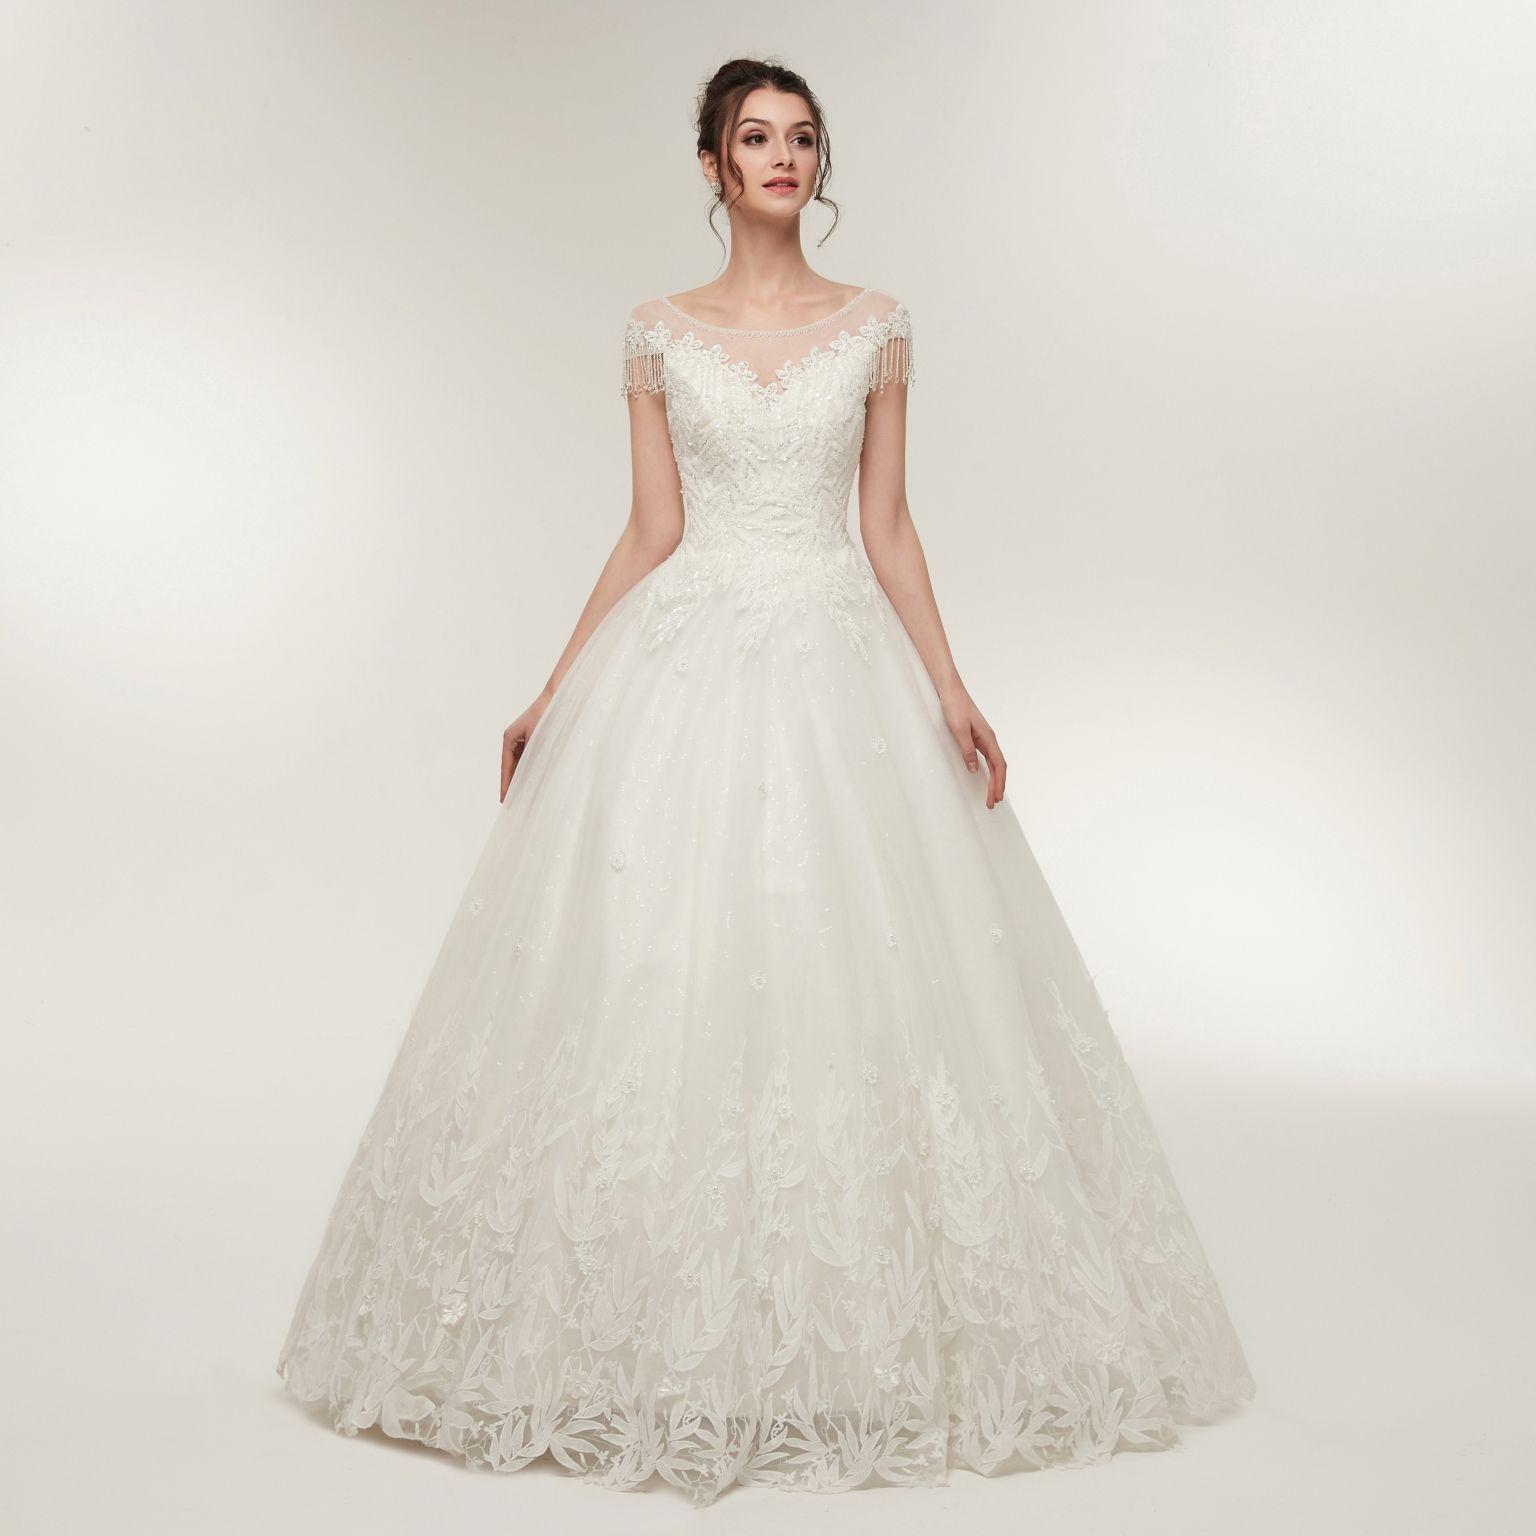 Vestidos de Novia Wedding Dress Floor Length Key Hole Back wedding dresses Lace Up Back Robe de Mariage Bridal Gown Party Dresses S640